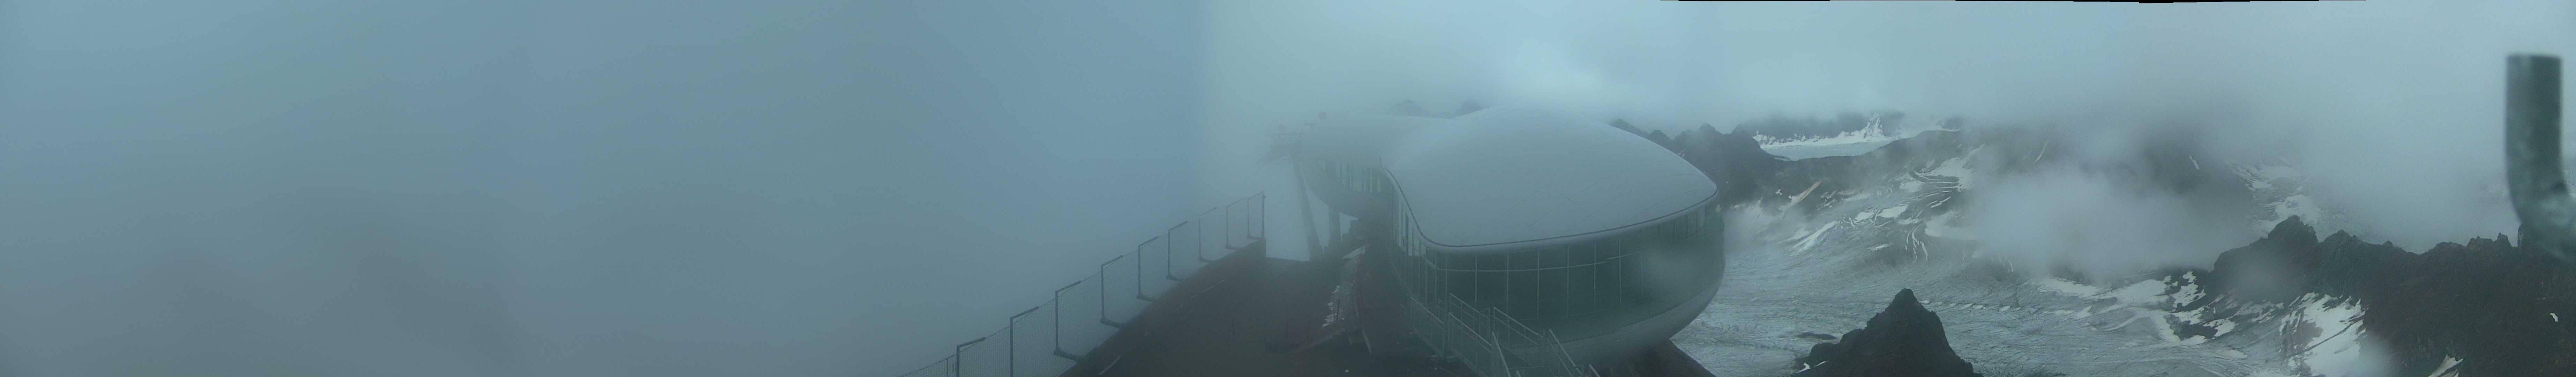 Webcam Panoramica Wildspitz - Pitztal